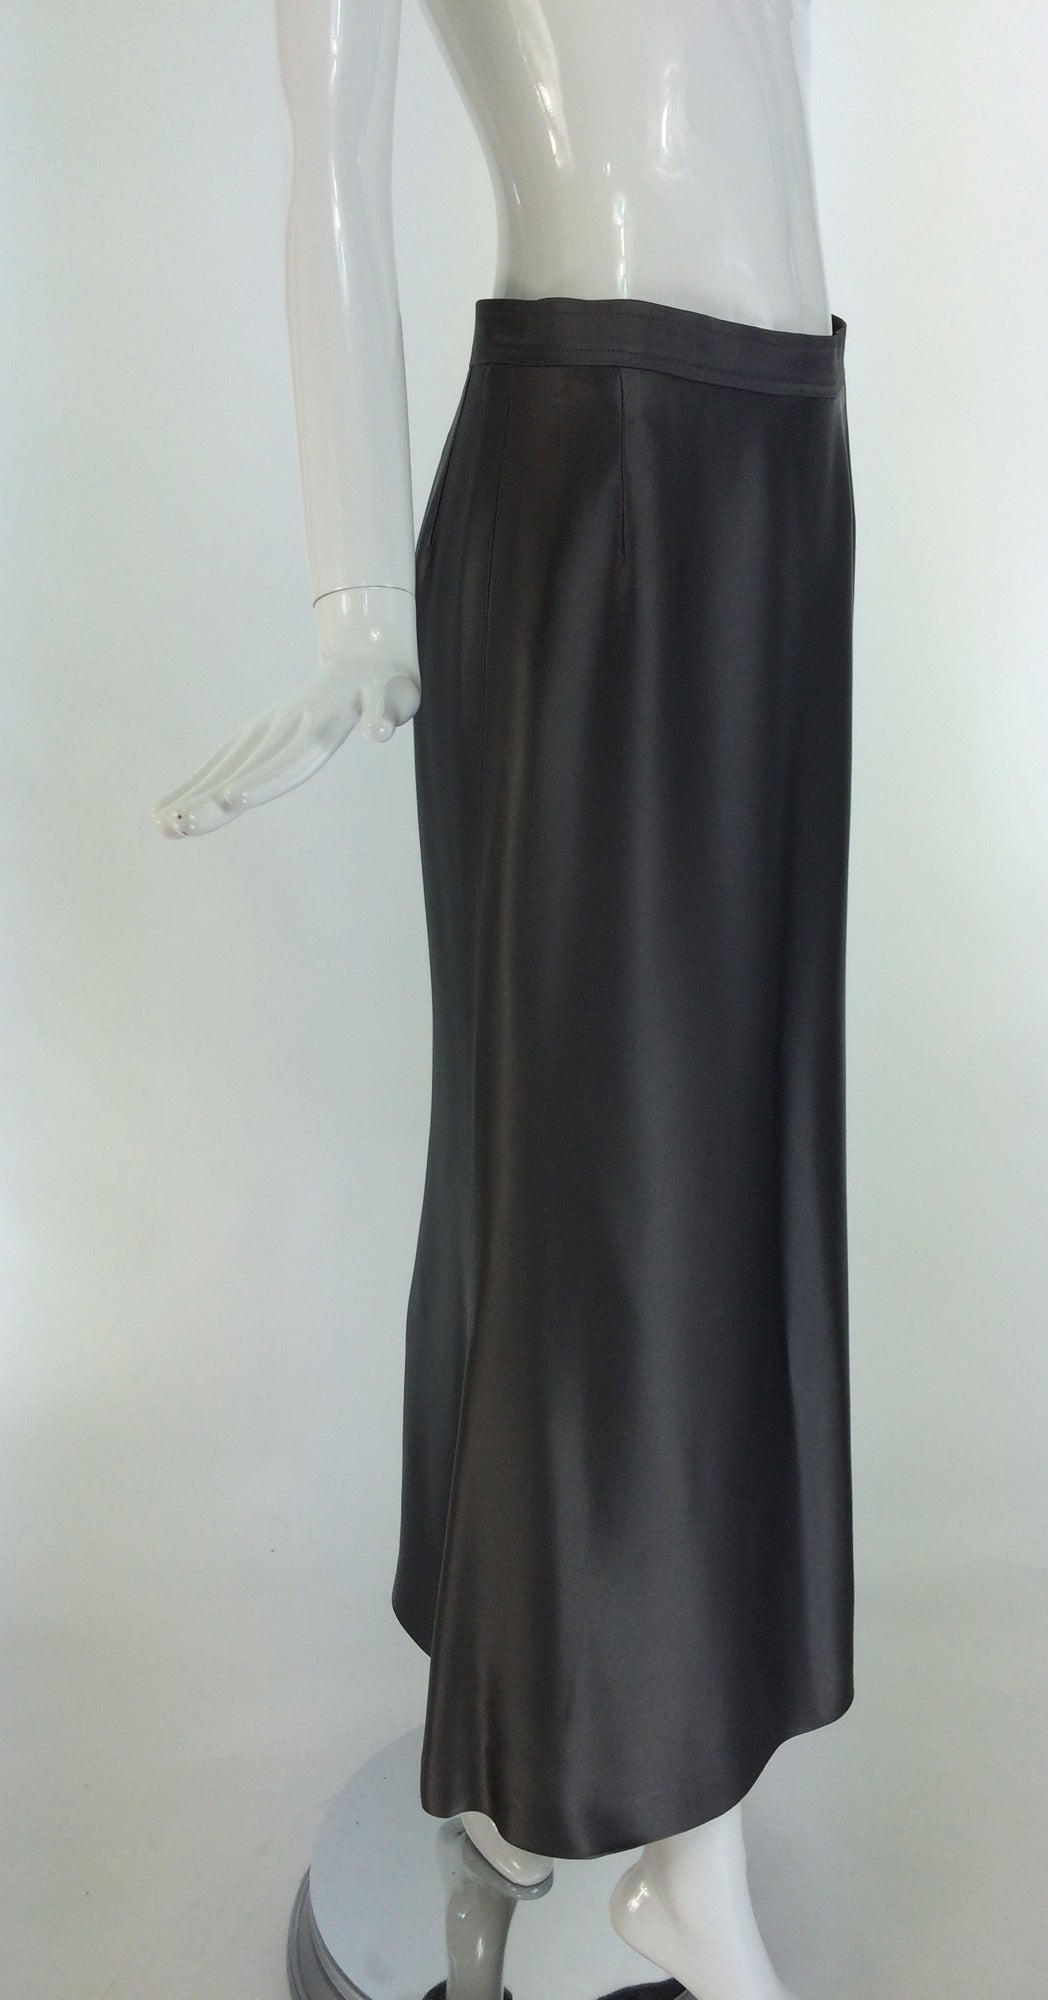 Yves St Laurent Rive Gauche silver grey satin evening skirt 1990s 3